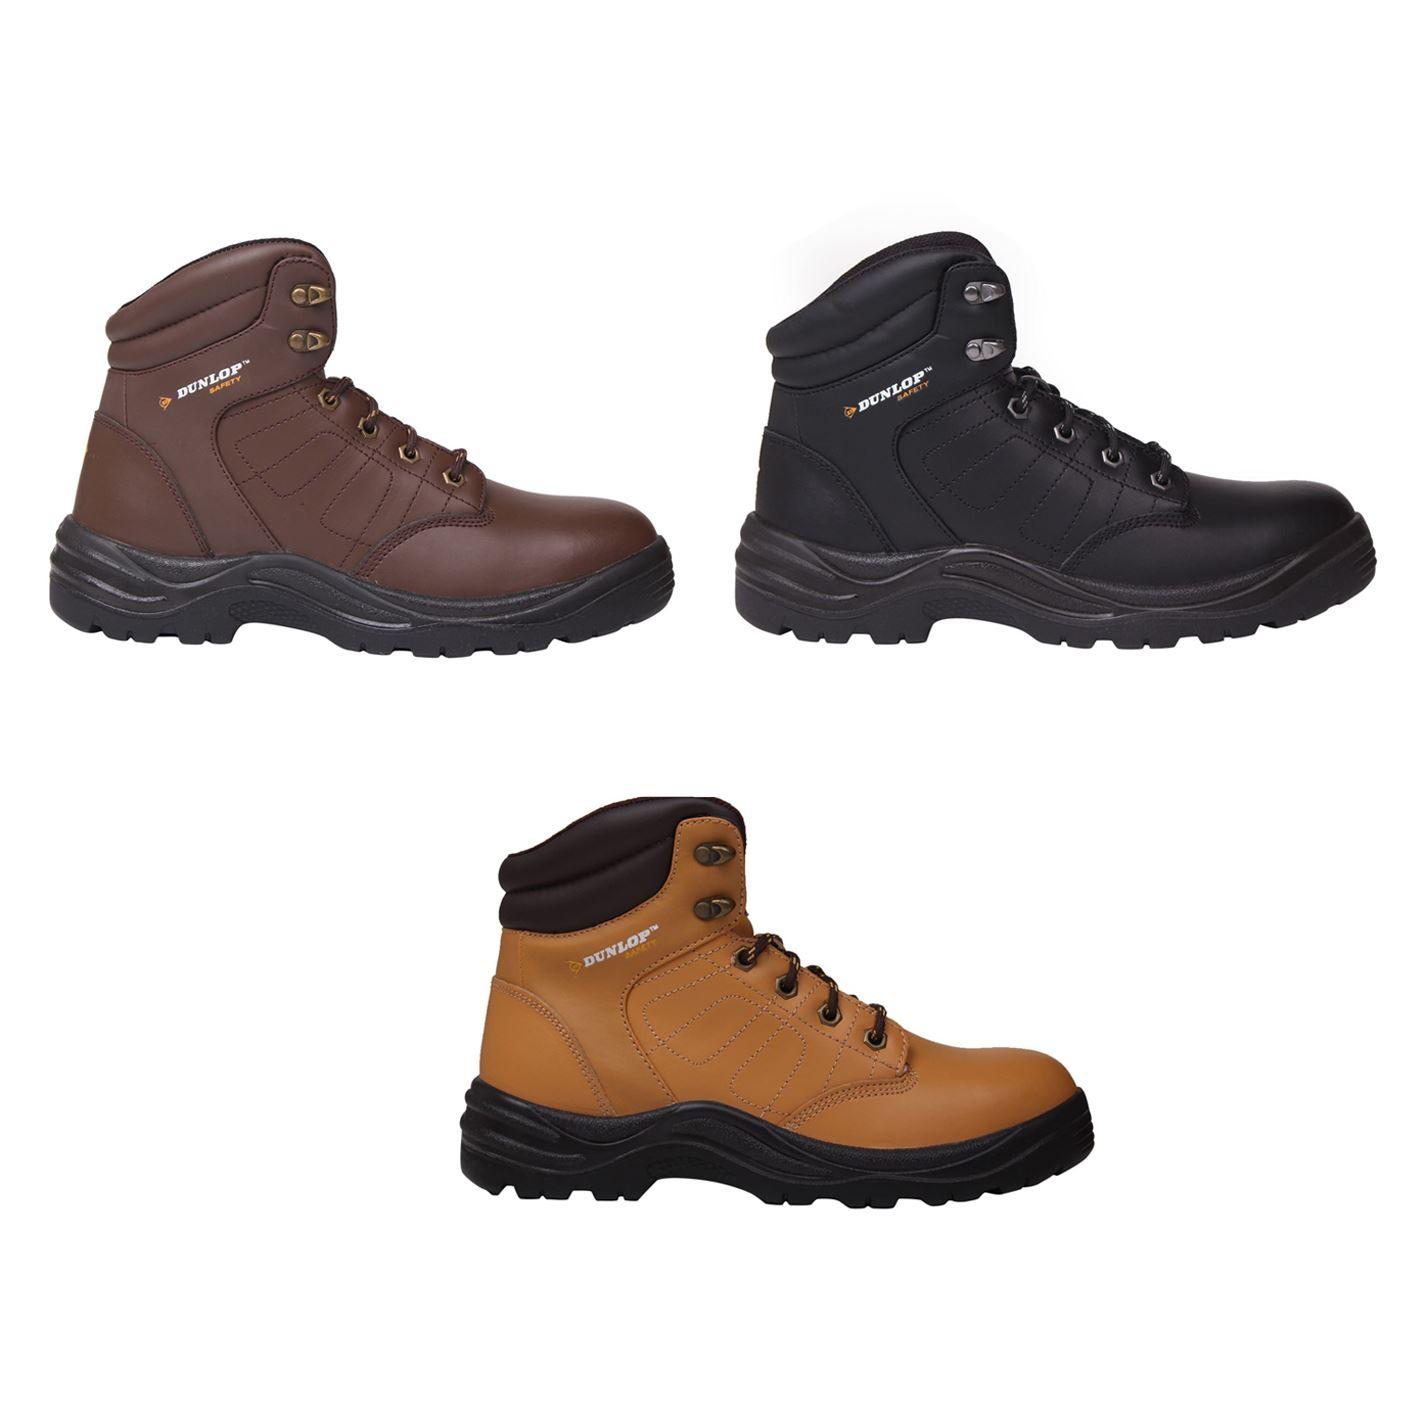 df78b12d969 Details about Dunlop Dakota Steel Toe Cap Safety Boots Mens Work Shoes